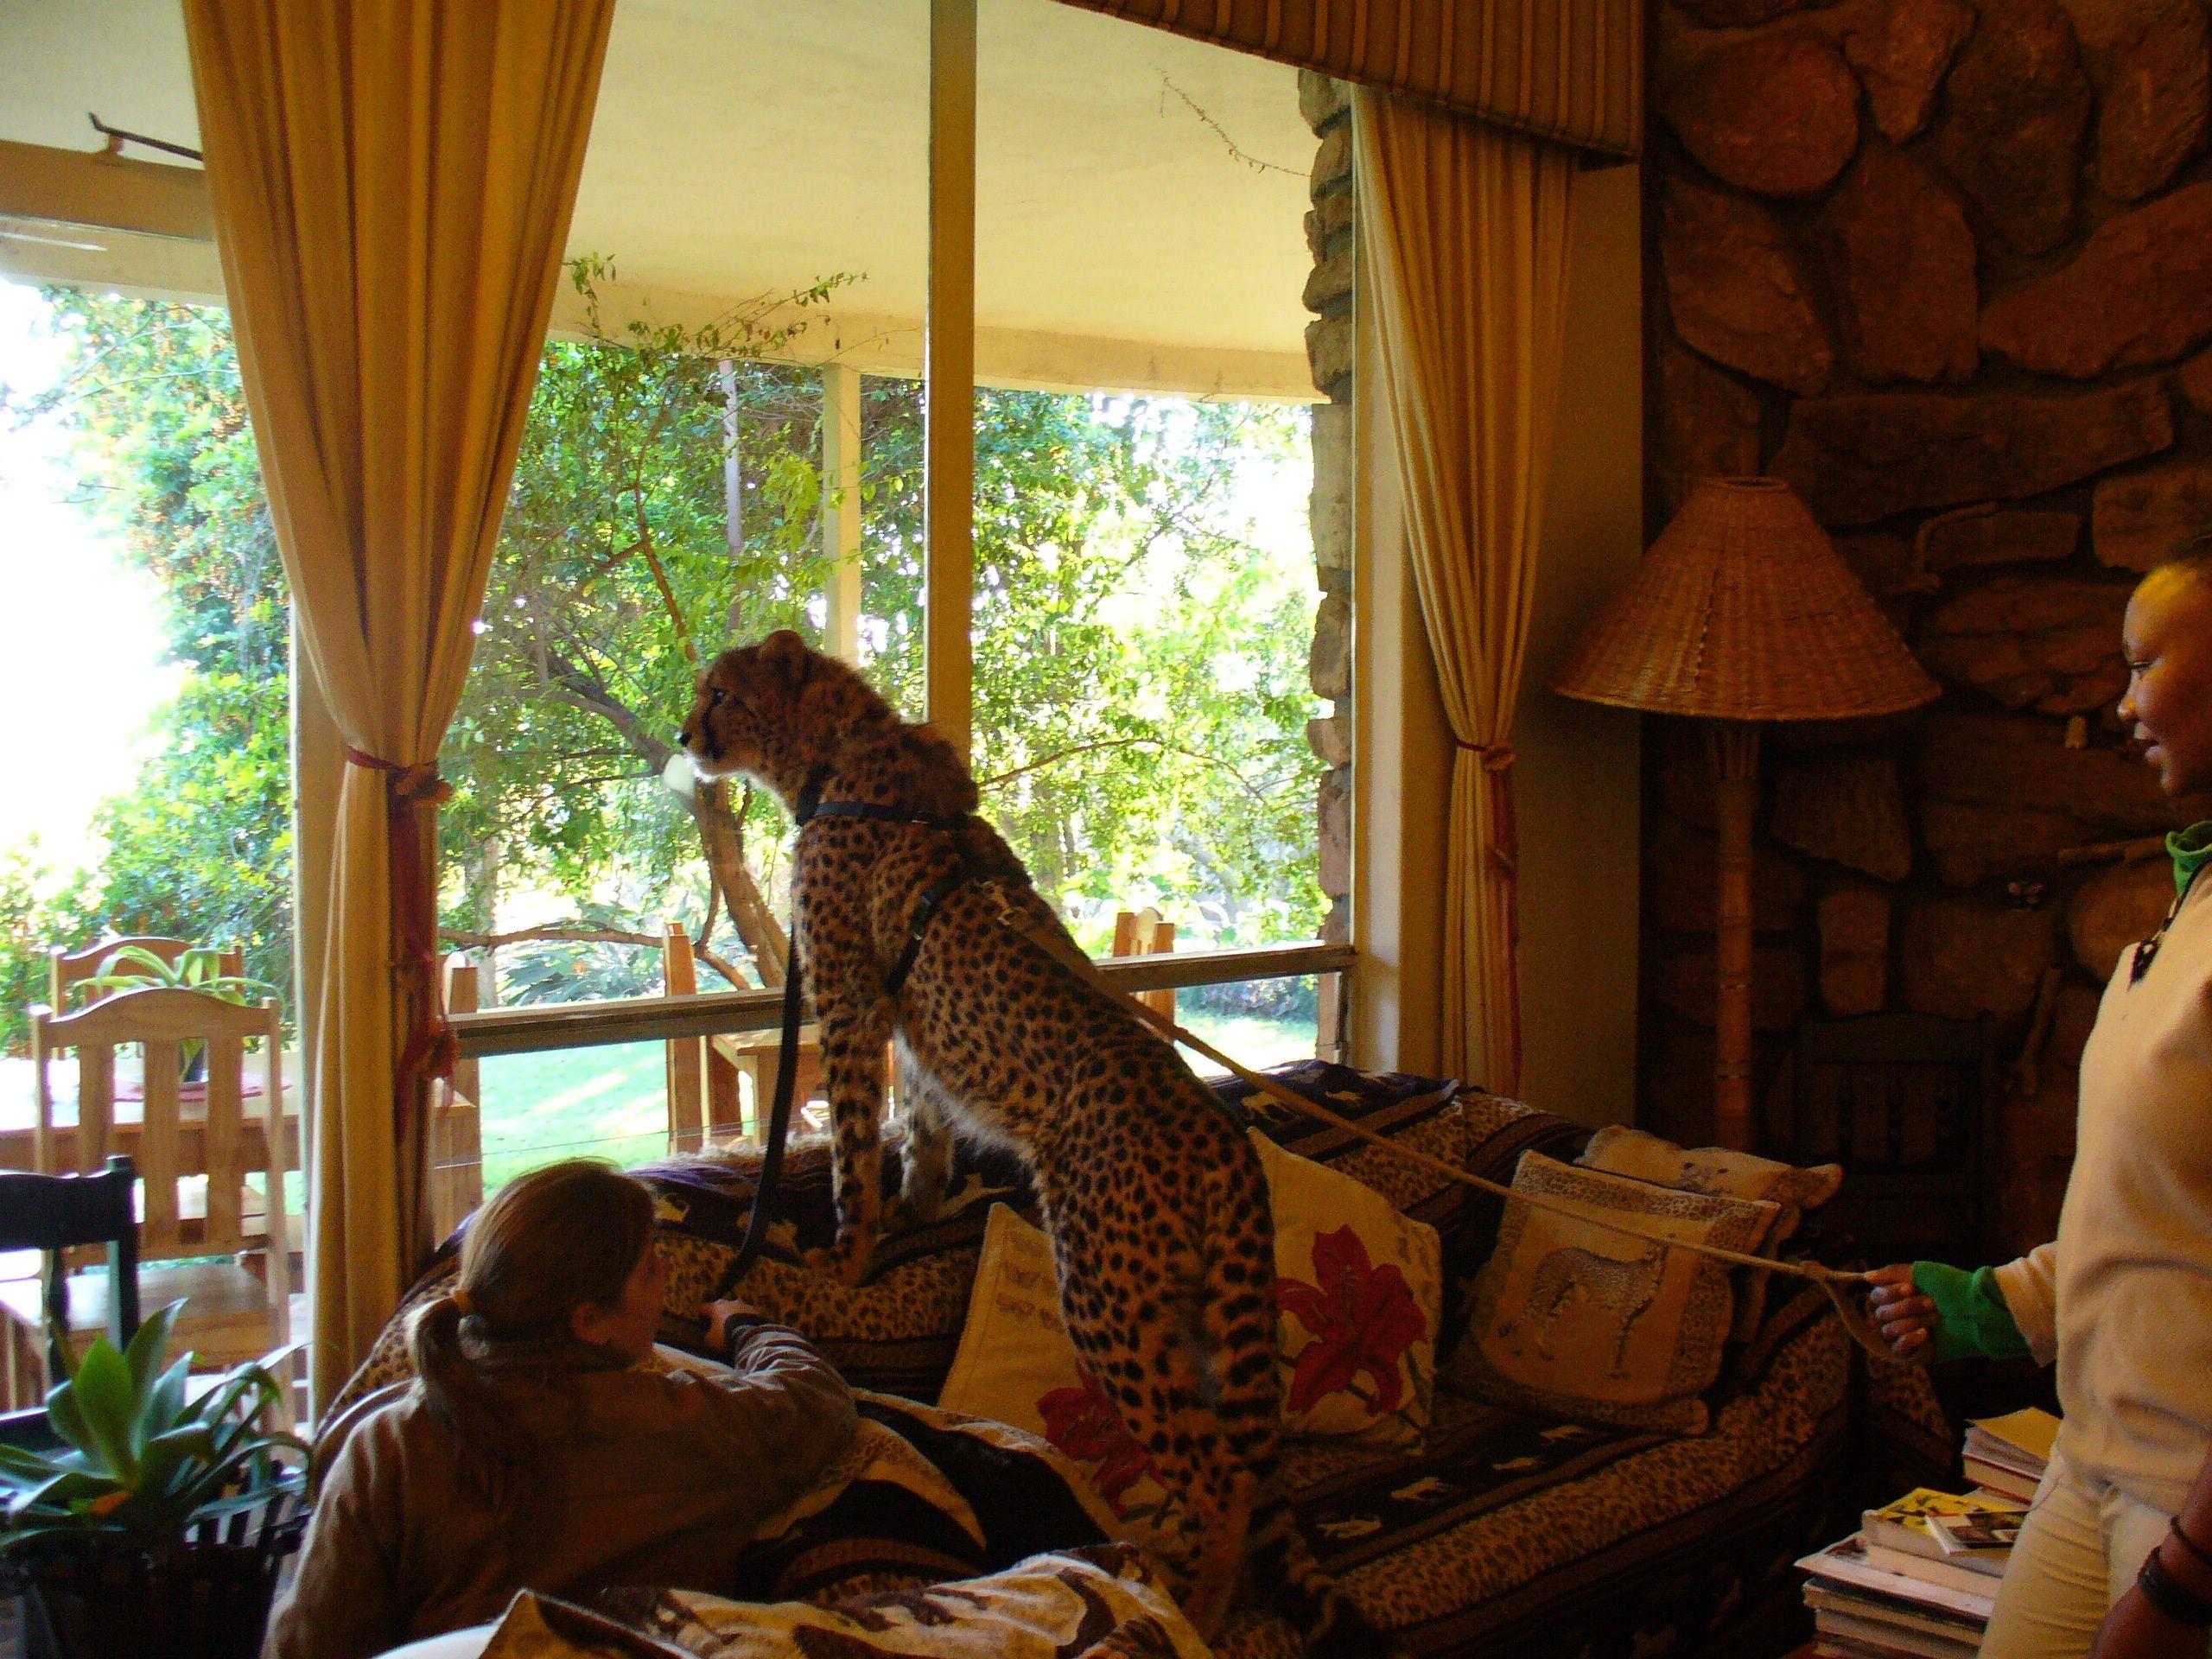 Yeats the ambassador cheetah doing some training at the Cheetah Lodge